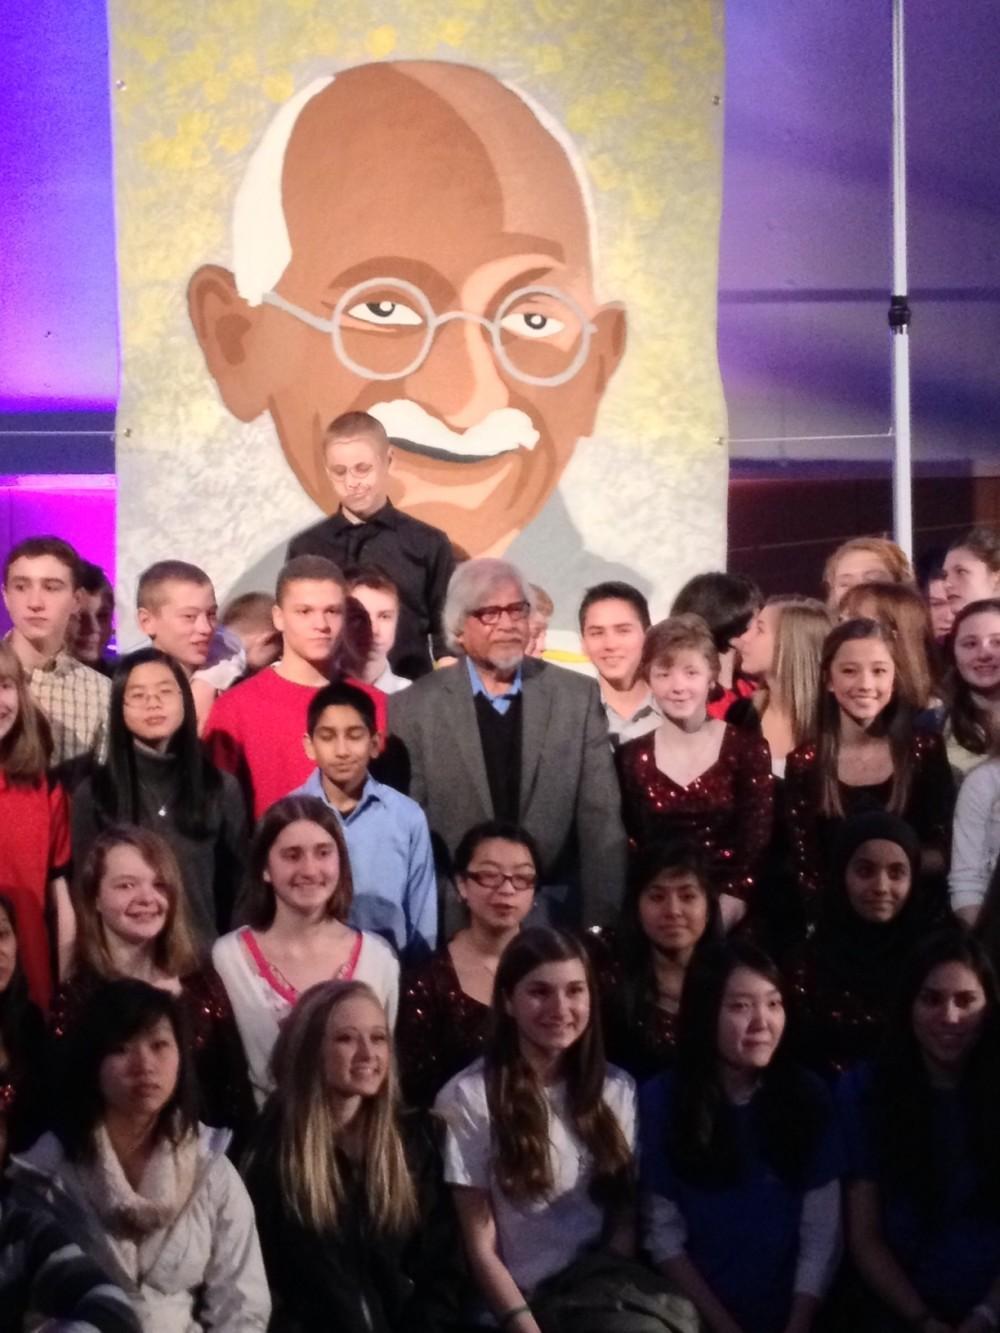 Arun+Gandhi+visits+Athey+Creek+Middle+School